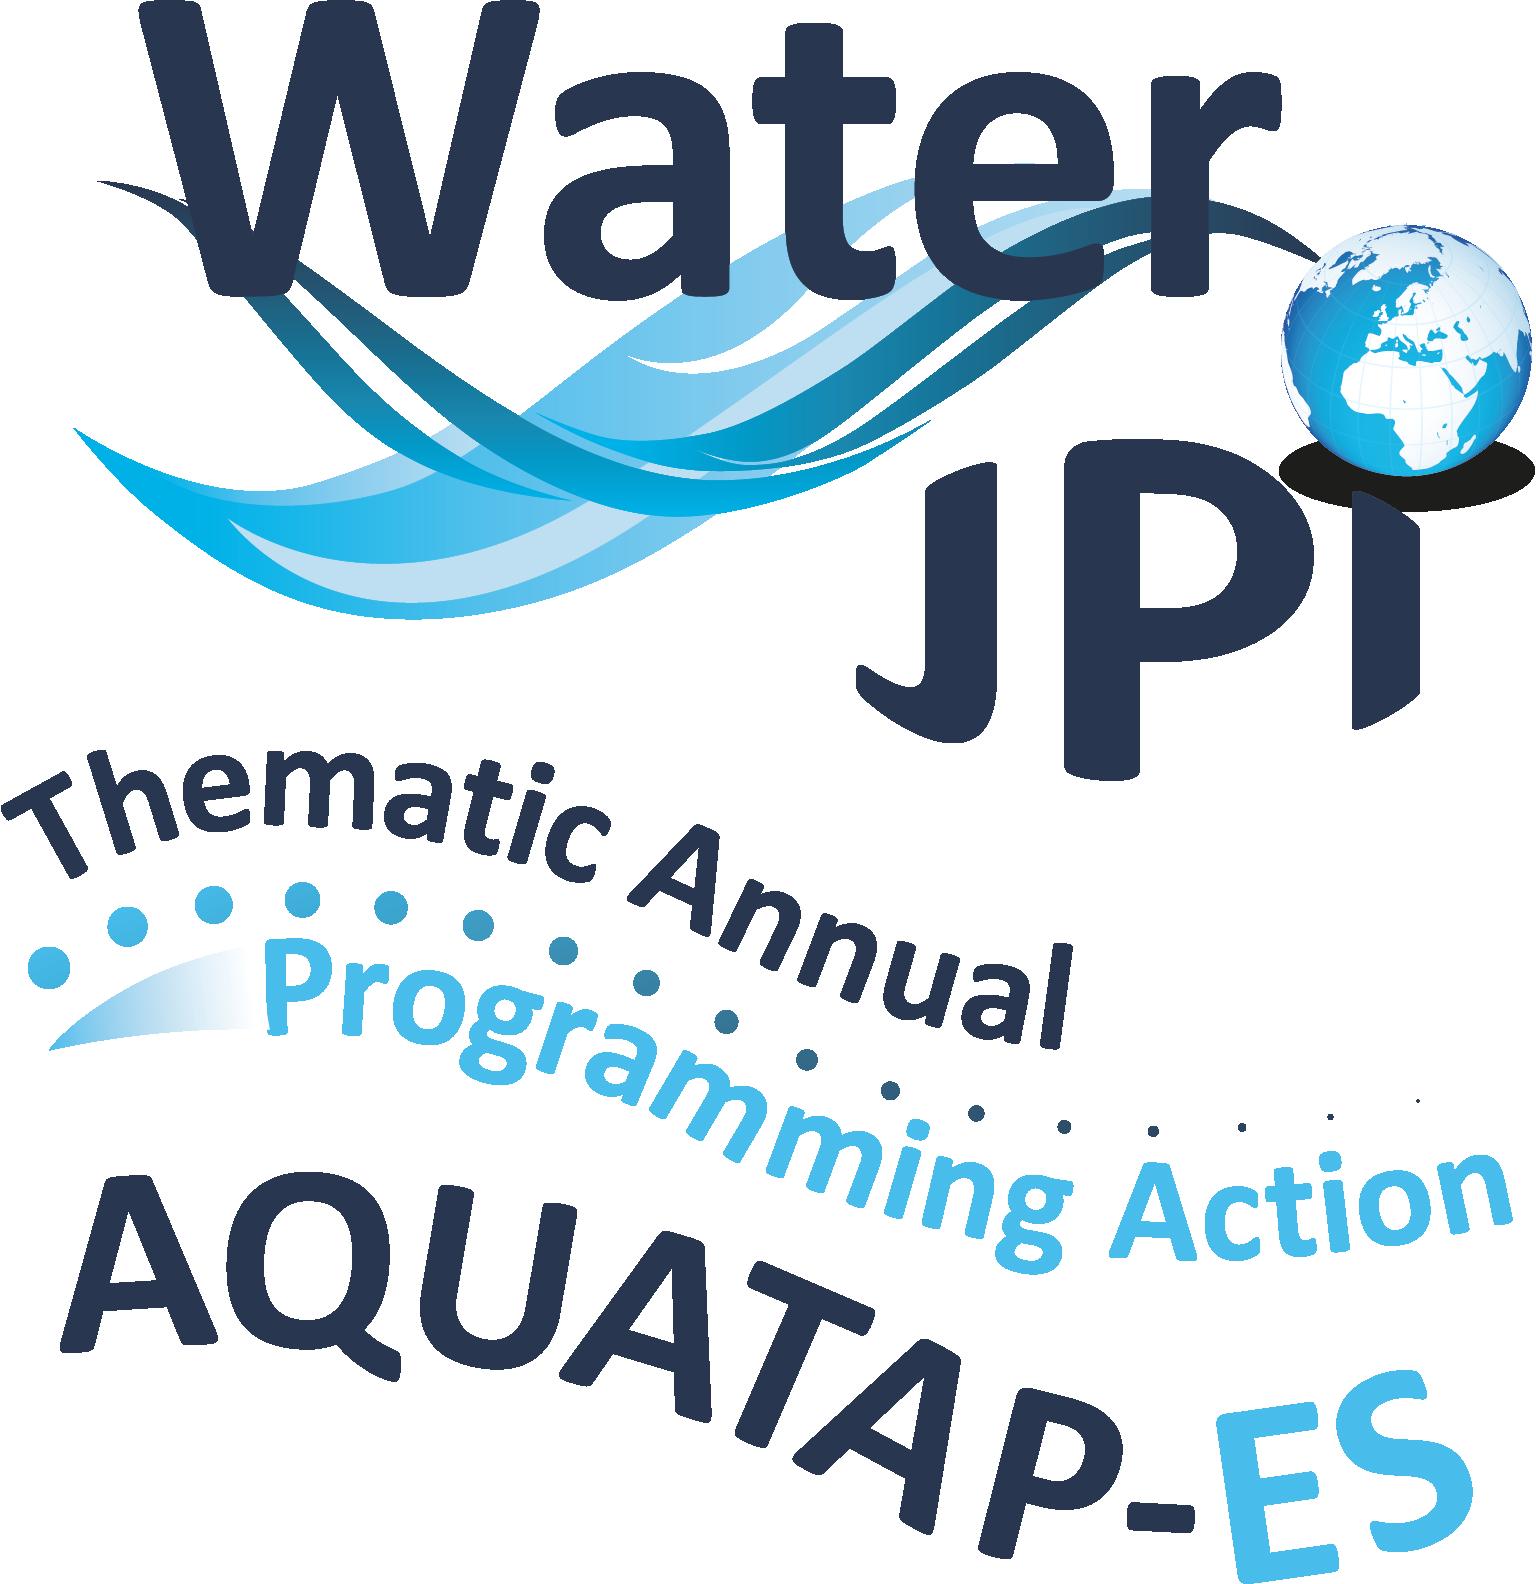 Water-AquatapES-Aug19-v4.jpg